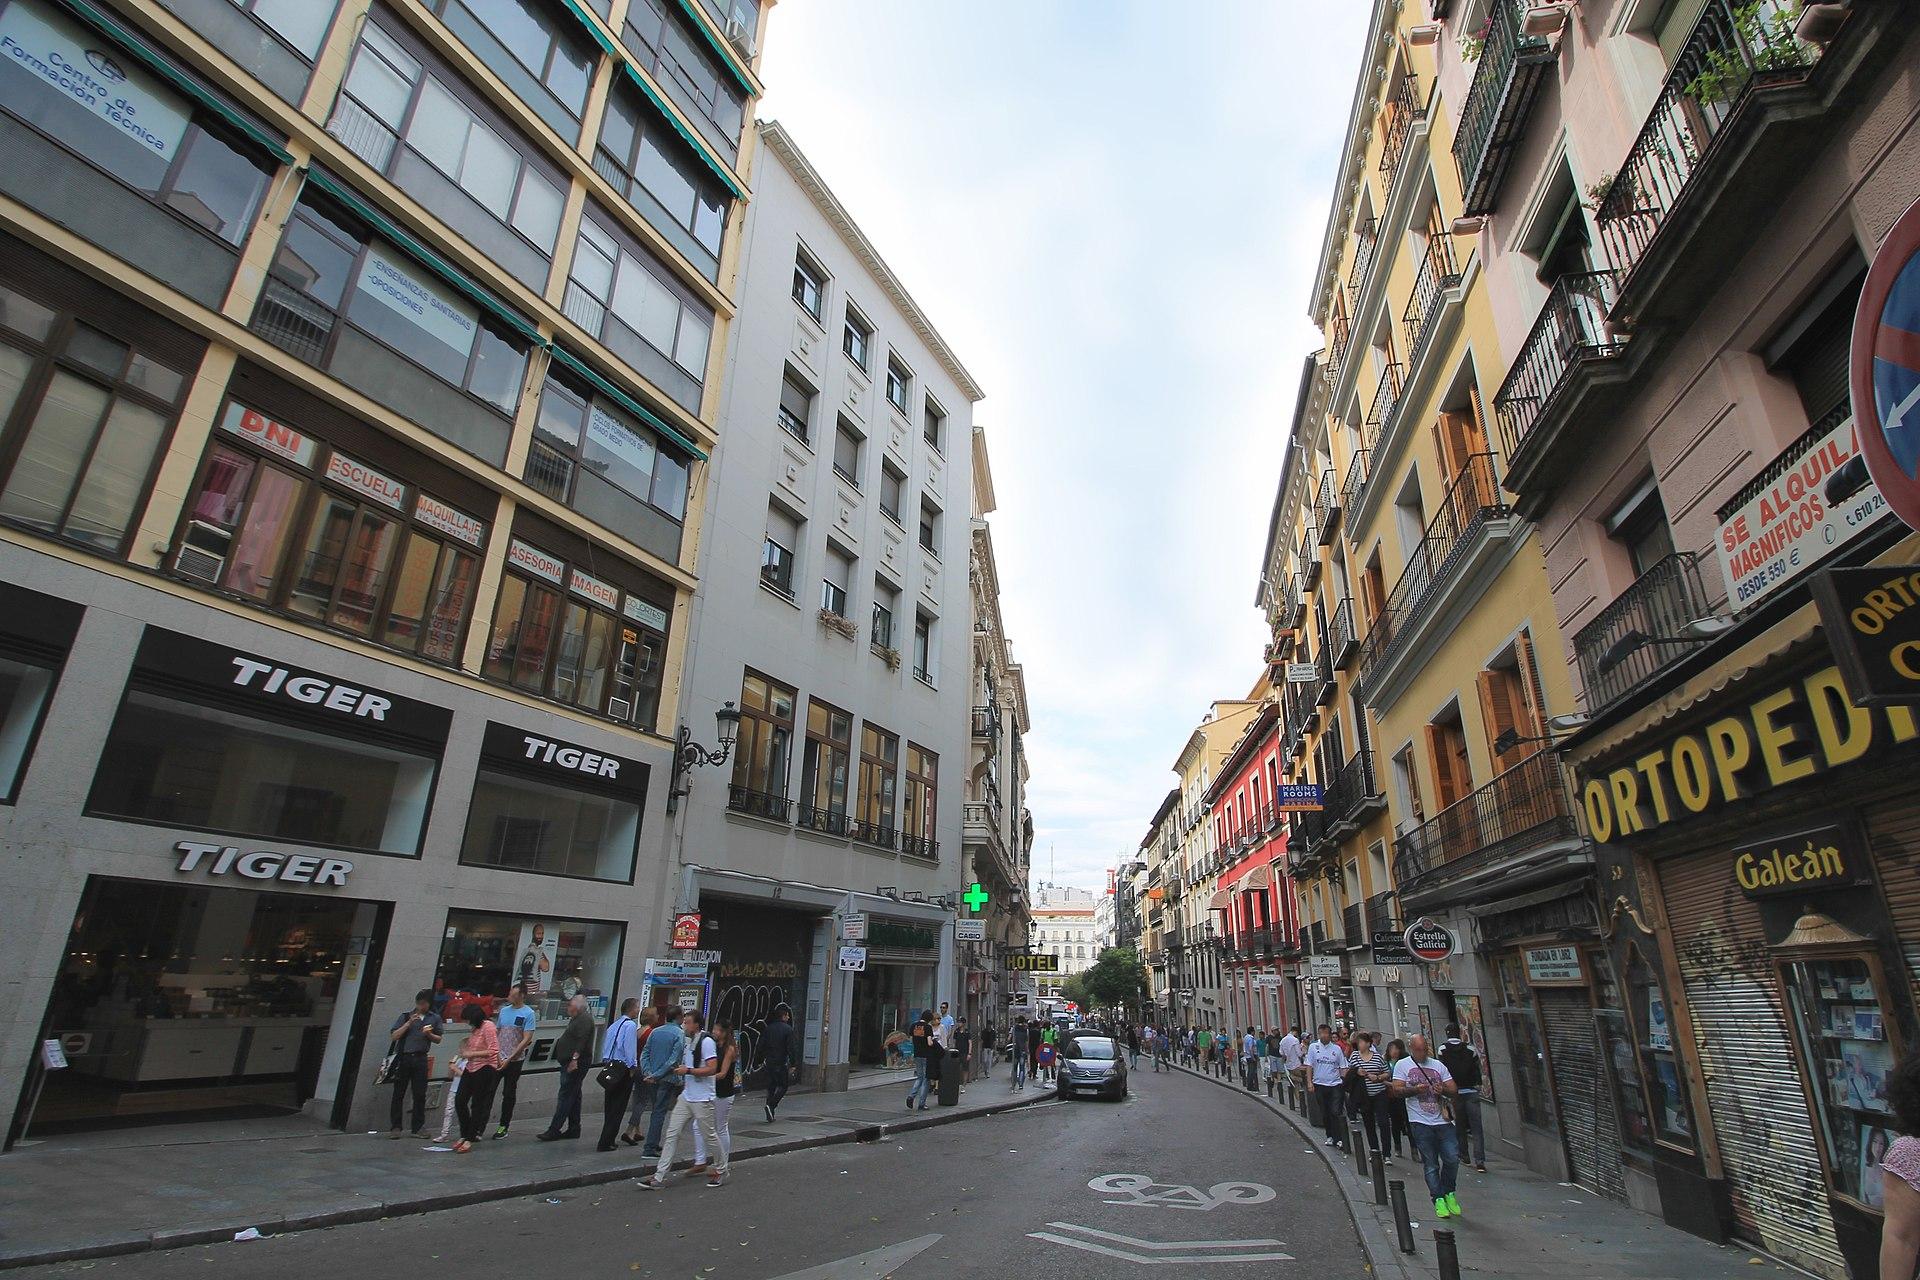 Calle de carretas wikipedia la enciclopedia libre - Calle nebulosas madrid ...